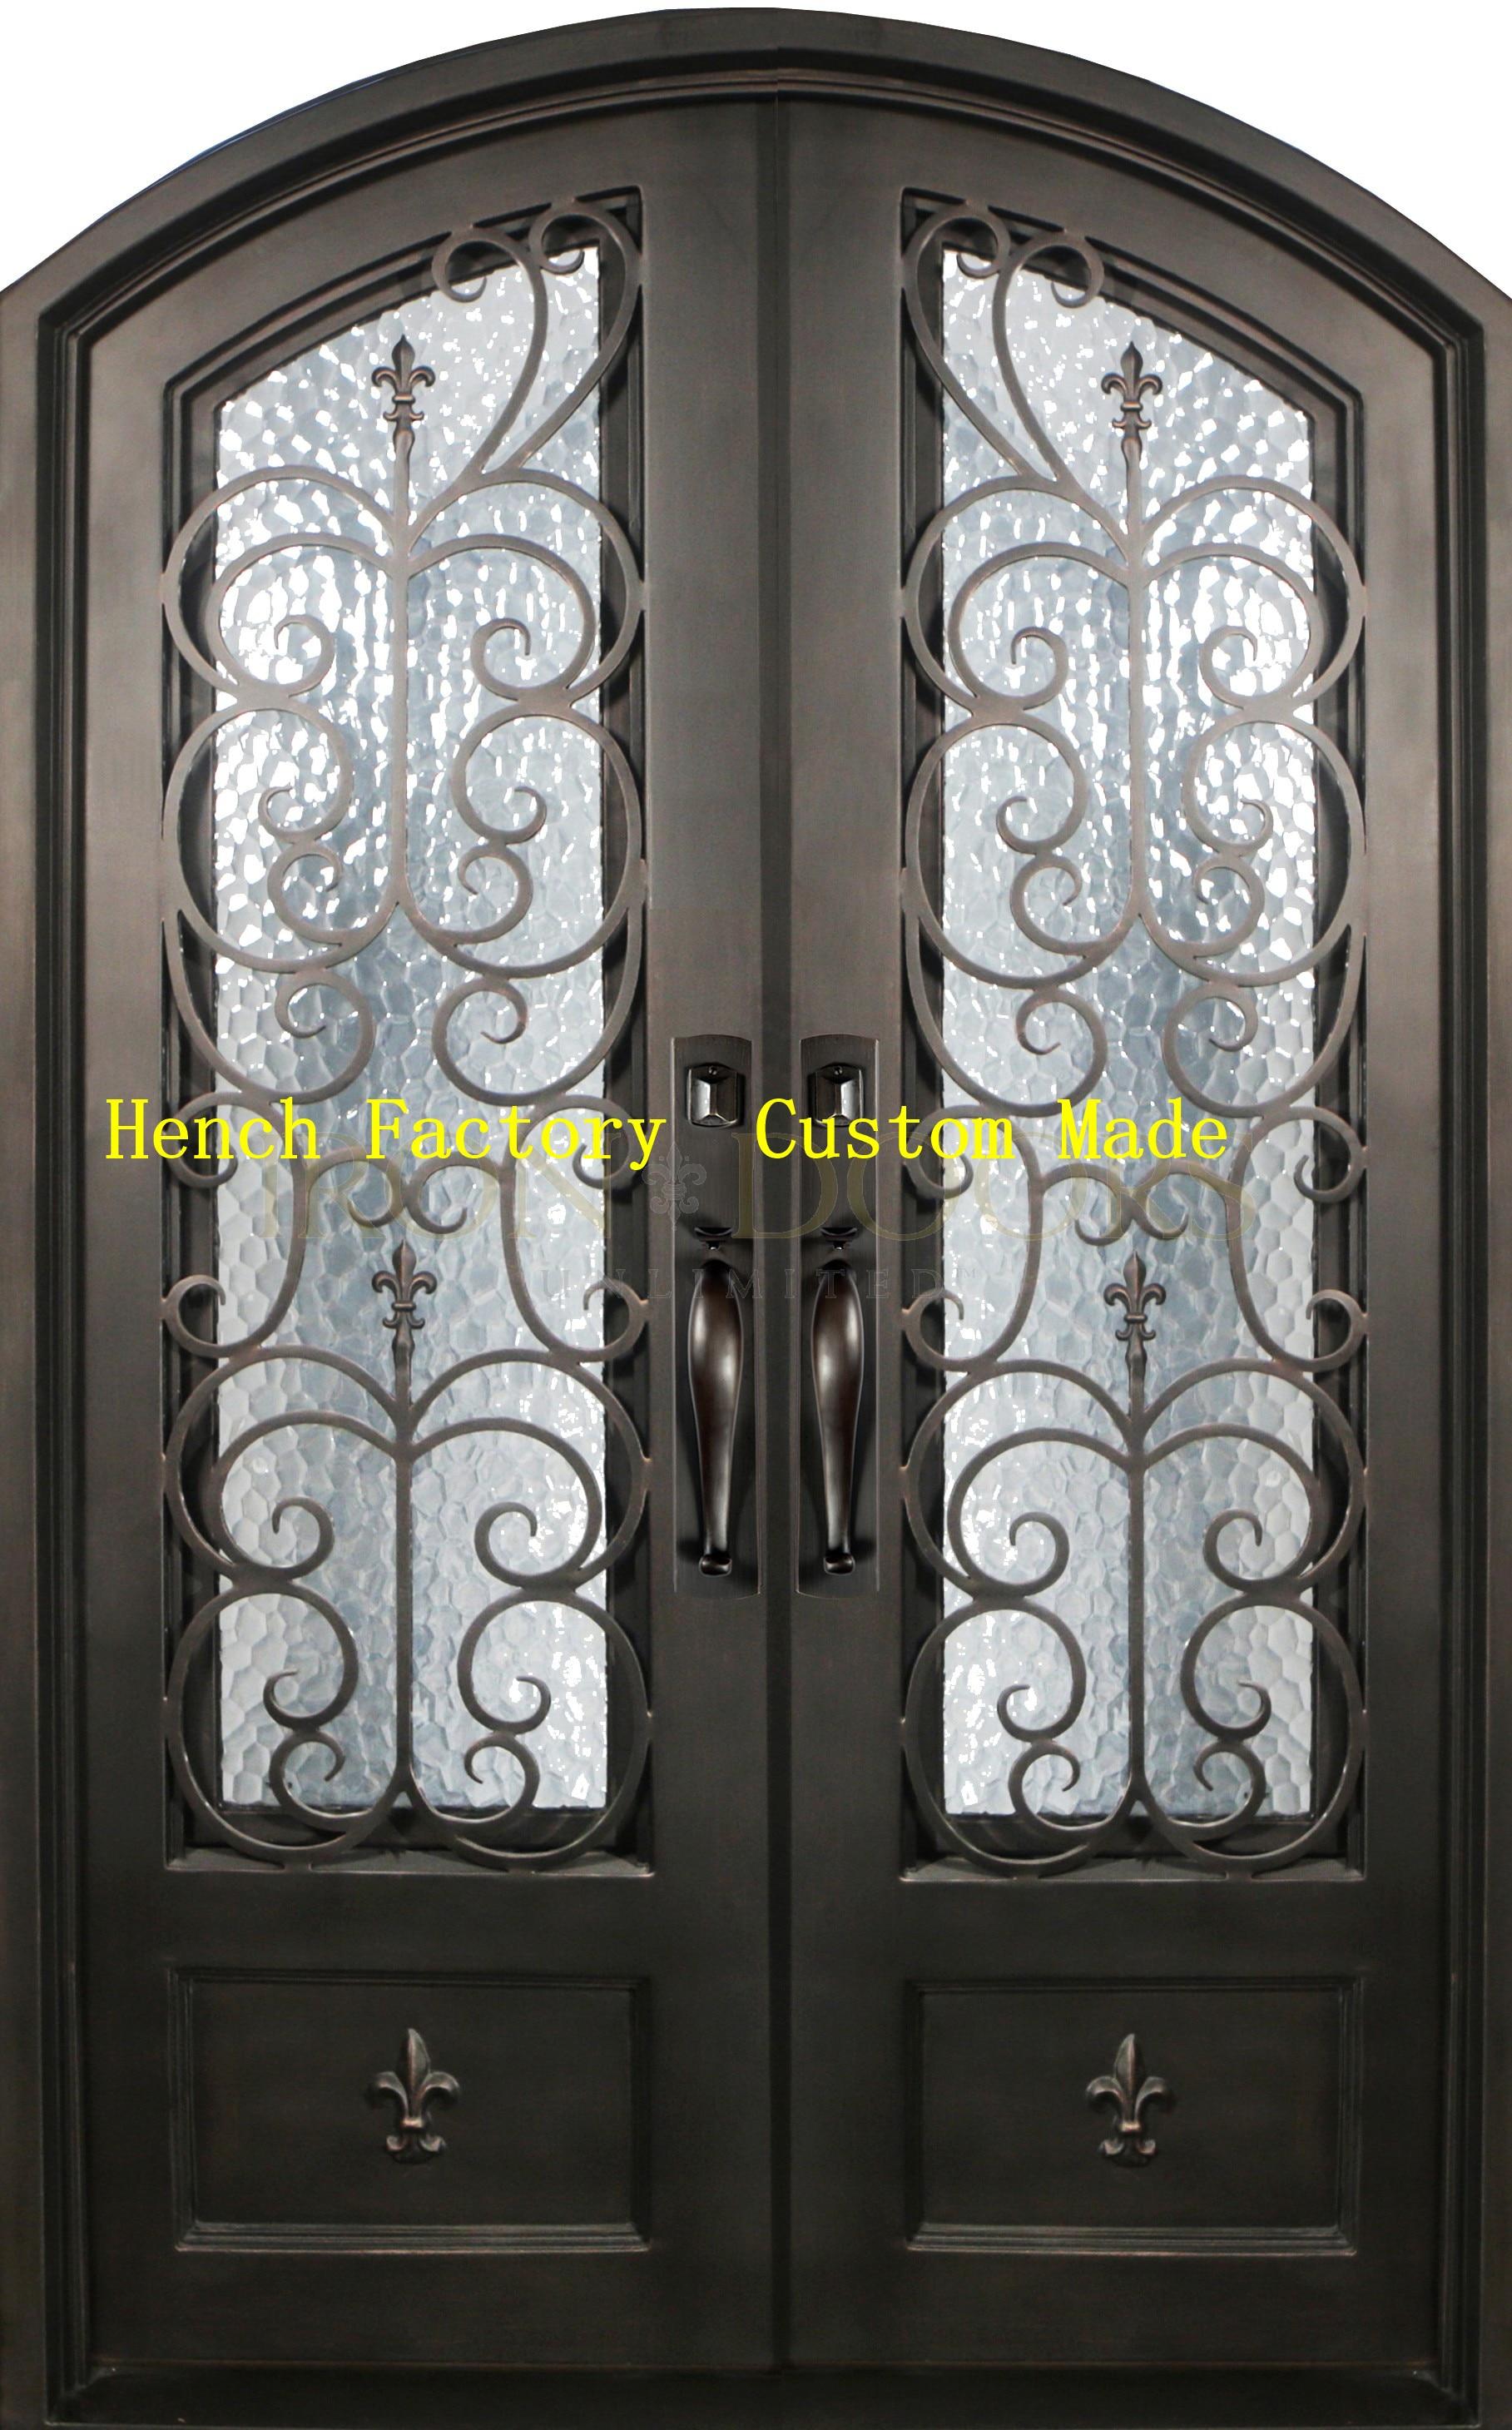 Shanghai Hench Brand China Factory 100% Custom Made Sale Australia Single Iron Door With Sidelights